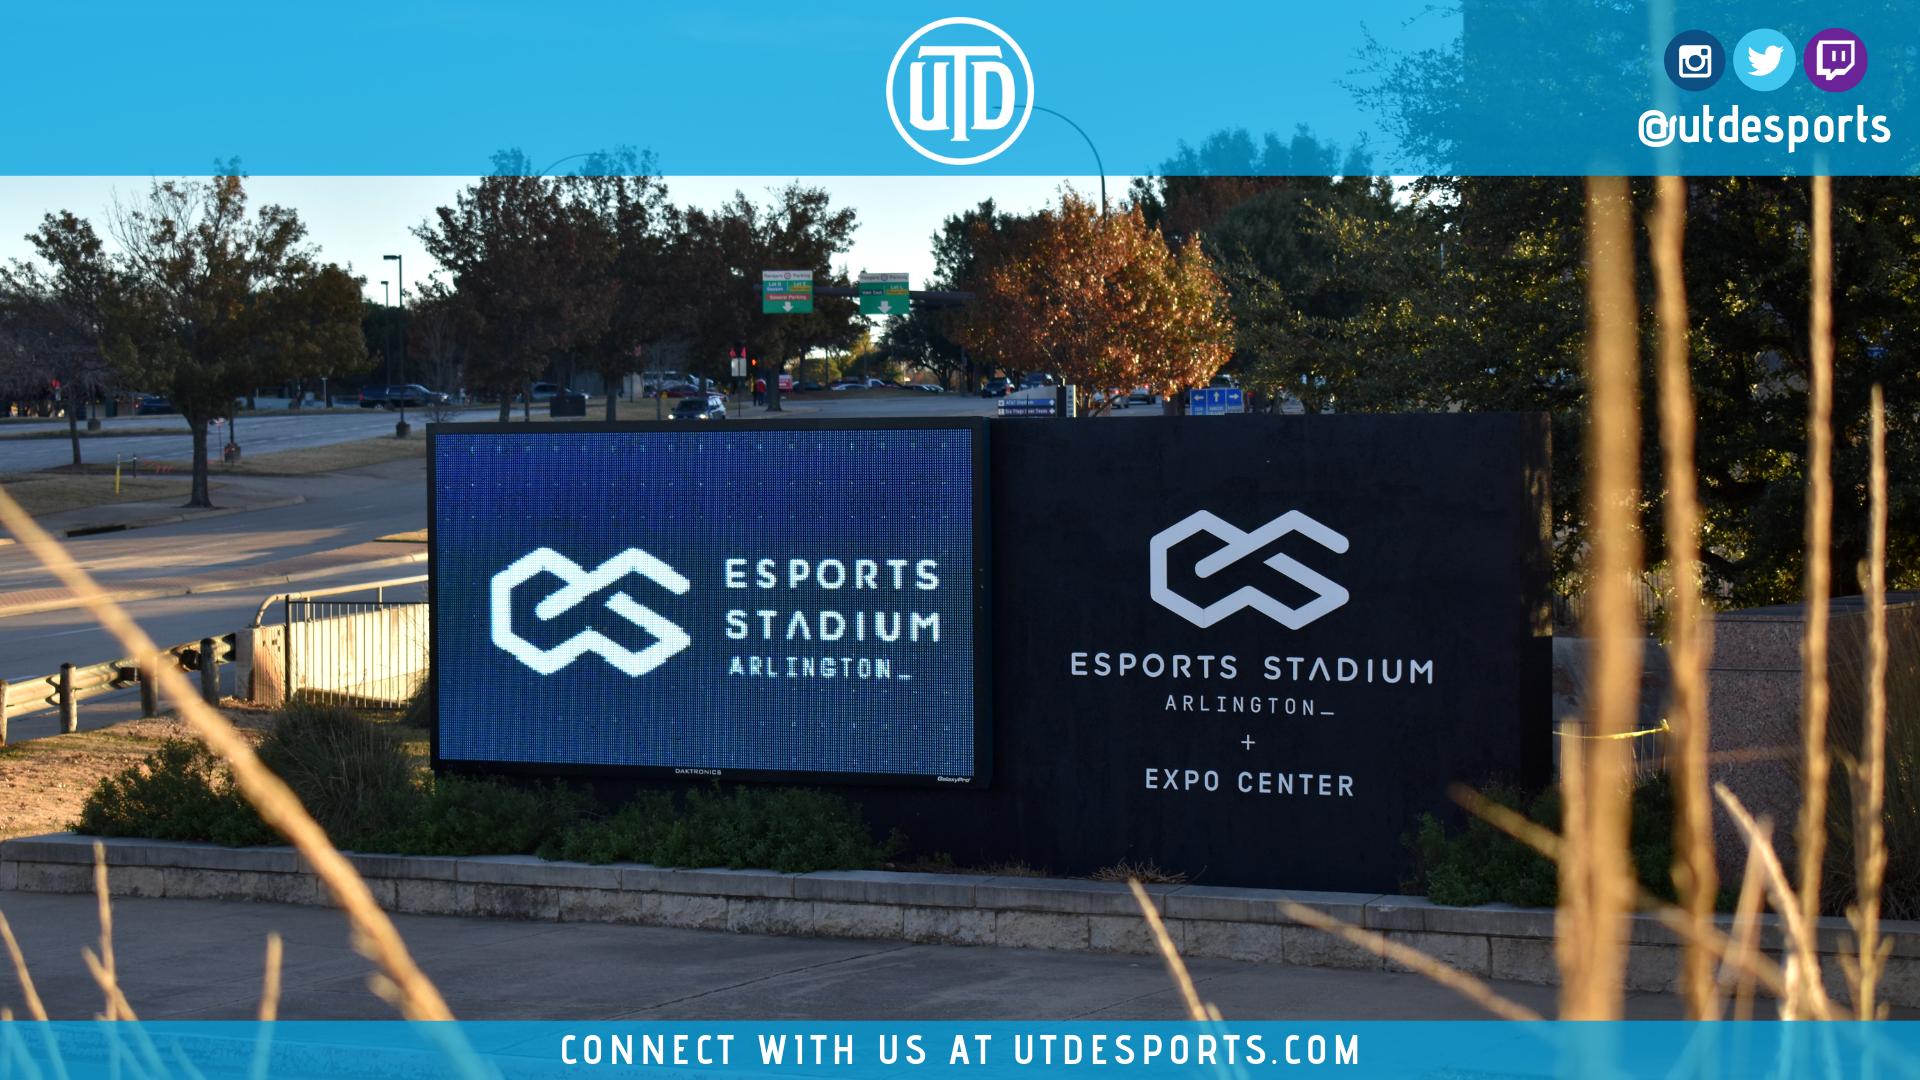 UTD Wins The First Esports Stadium Arlington LOL Tournament – UTD